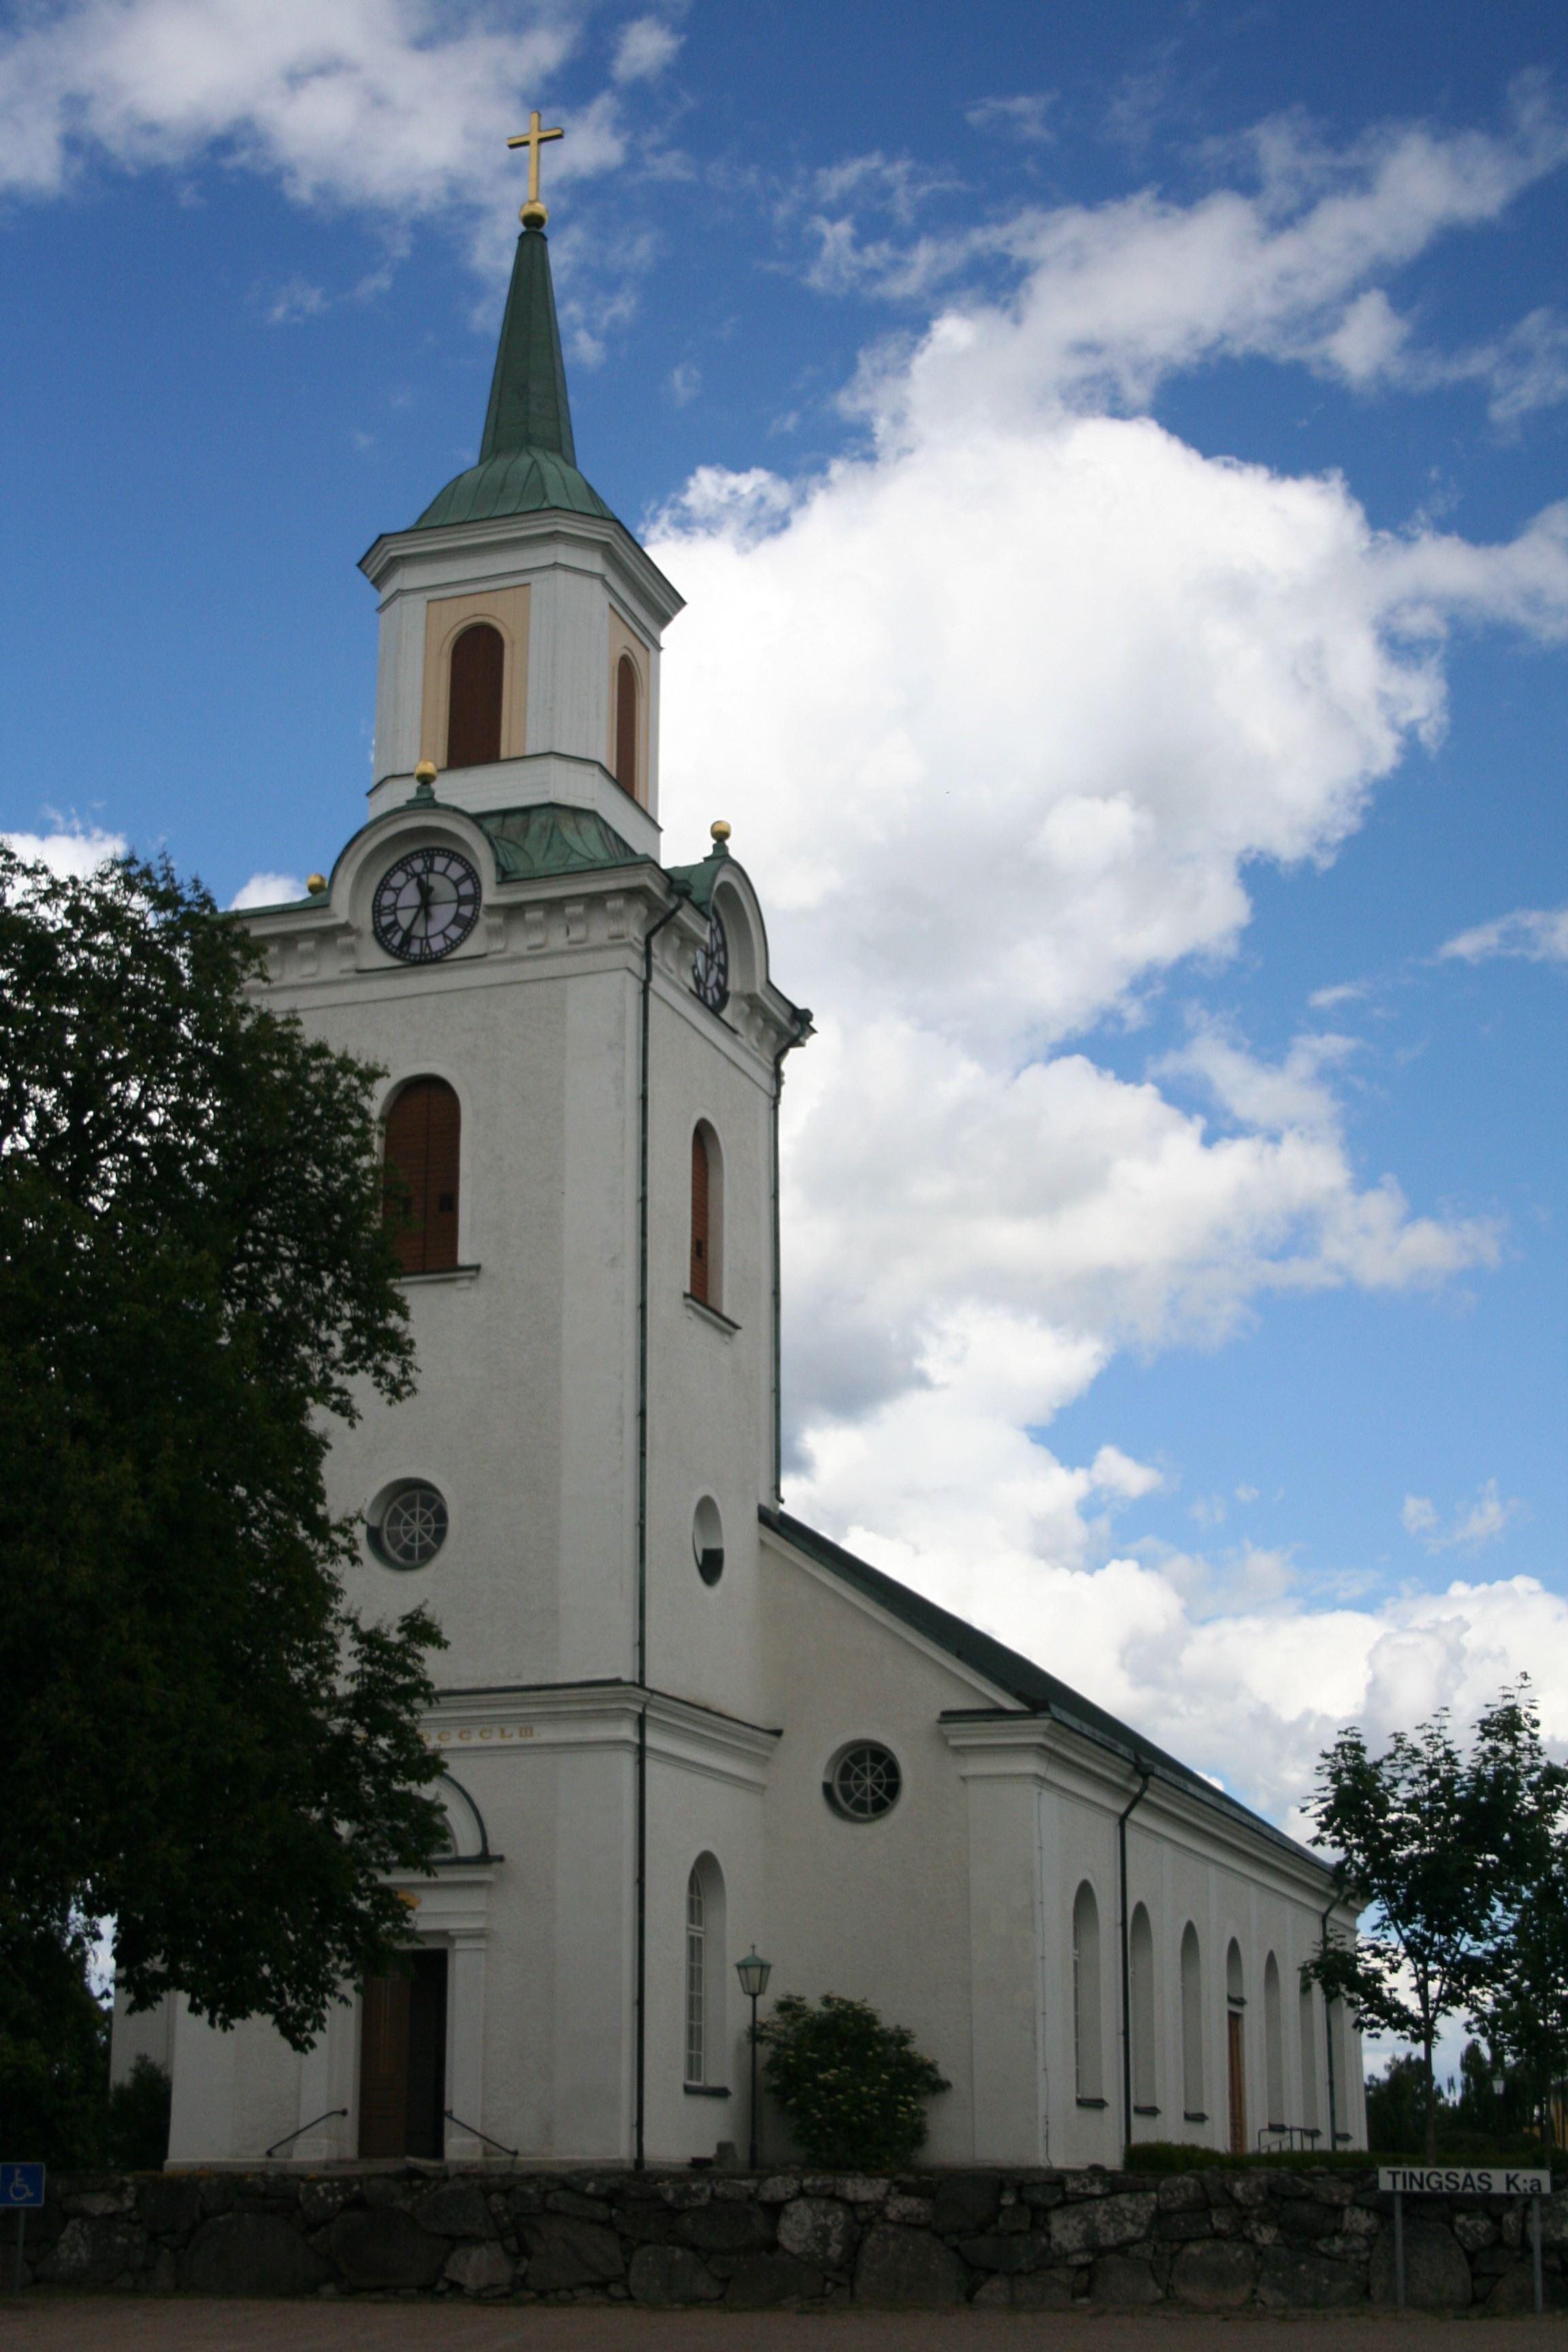 Sommermusik in Tingsås kyrka in Tingsryd